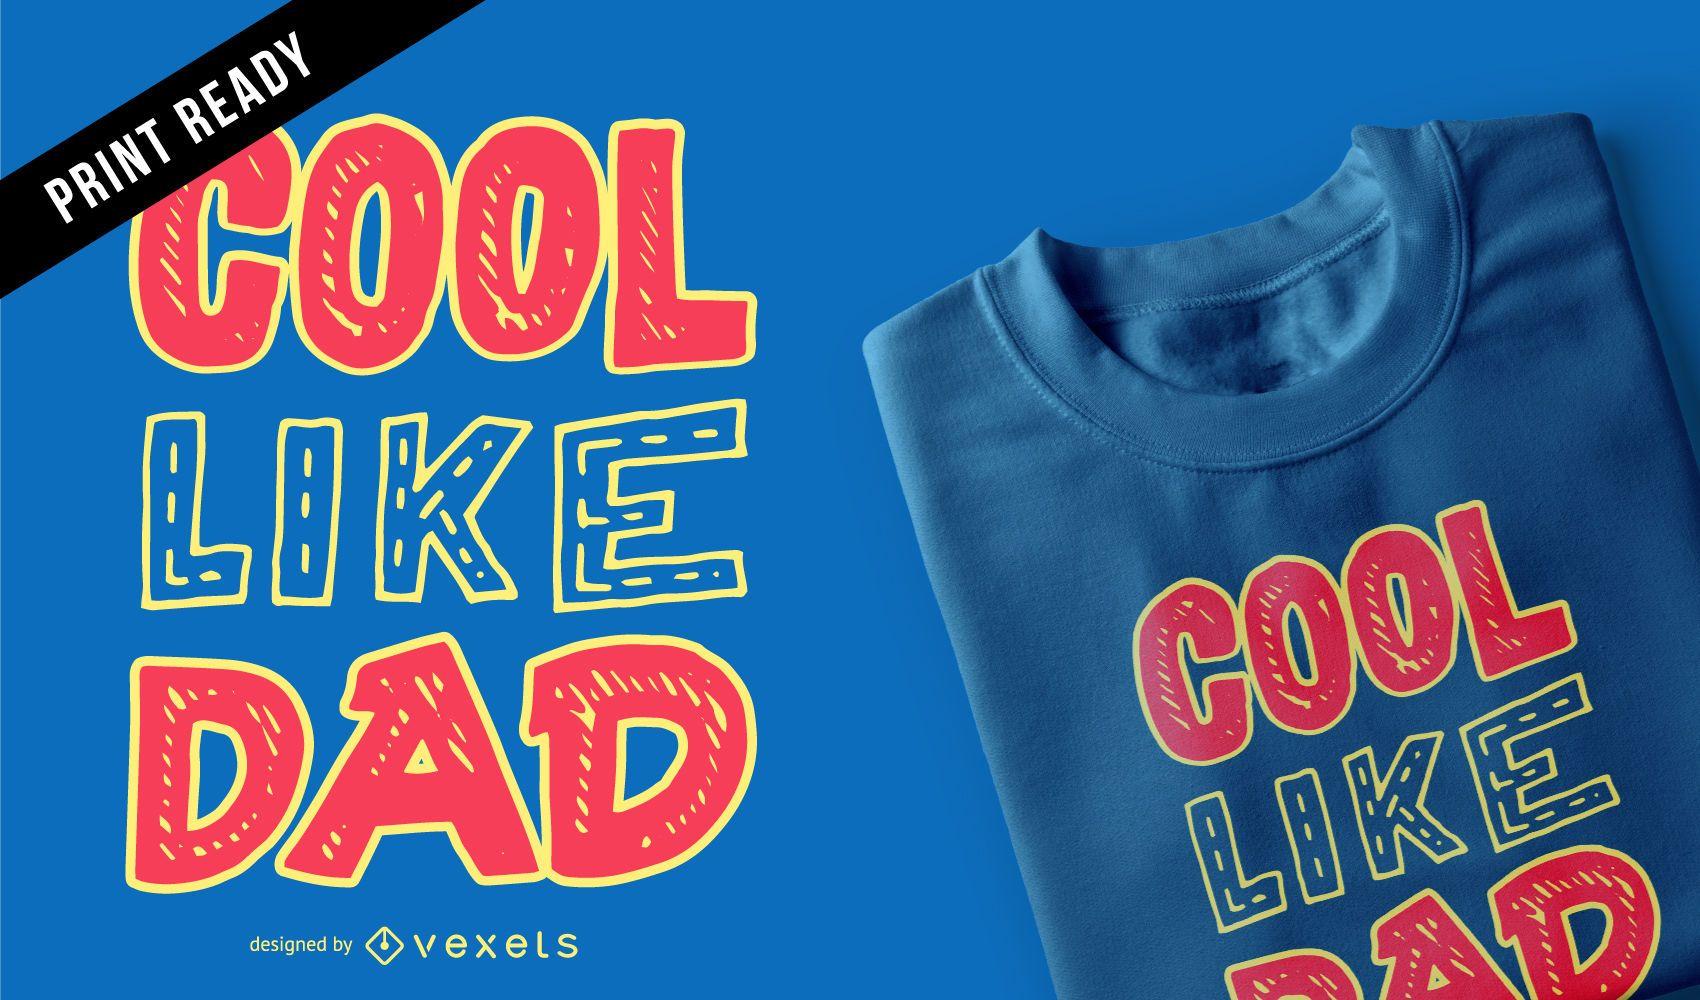 Cool dad kids t-shirt design - Vector download